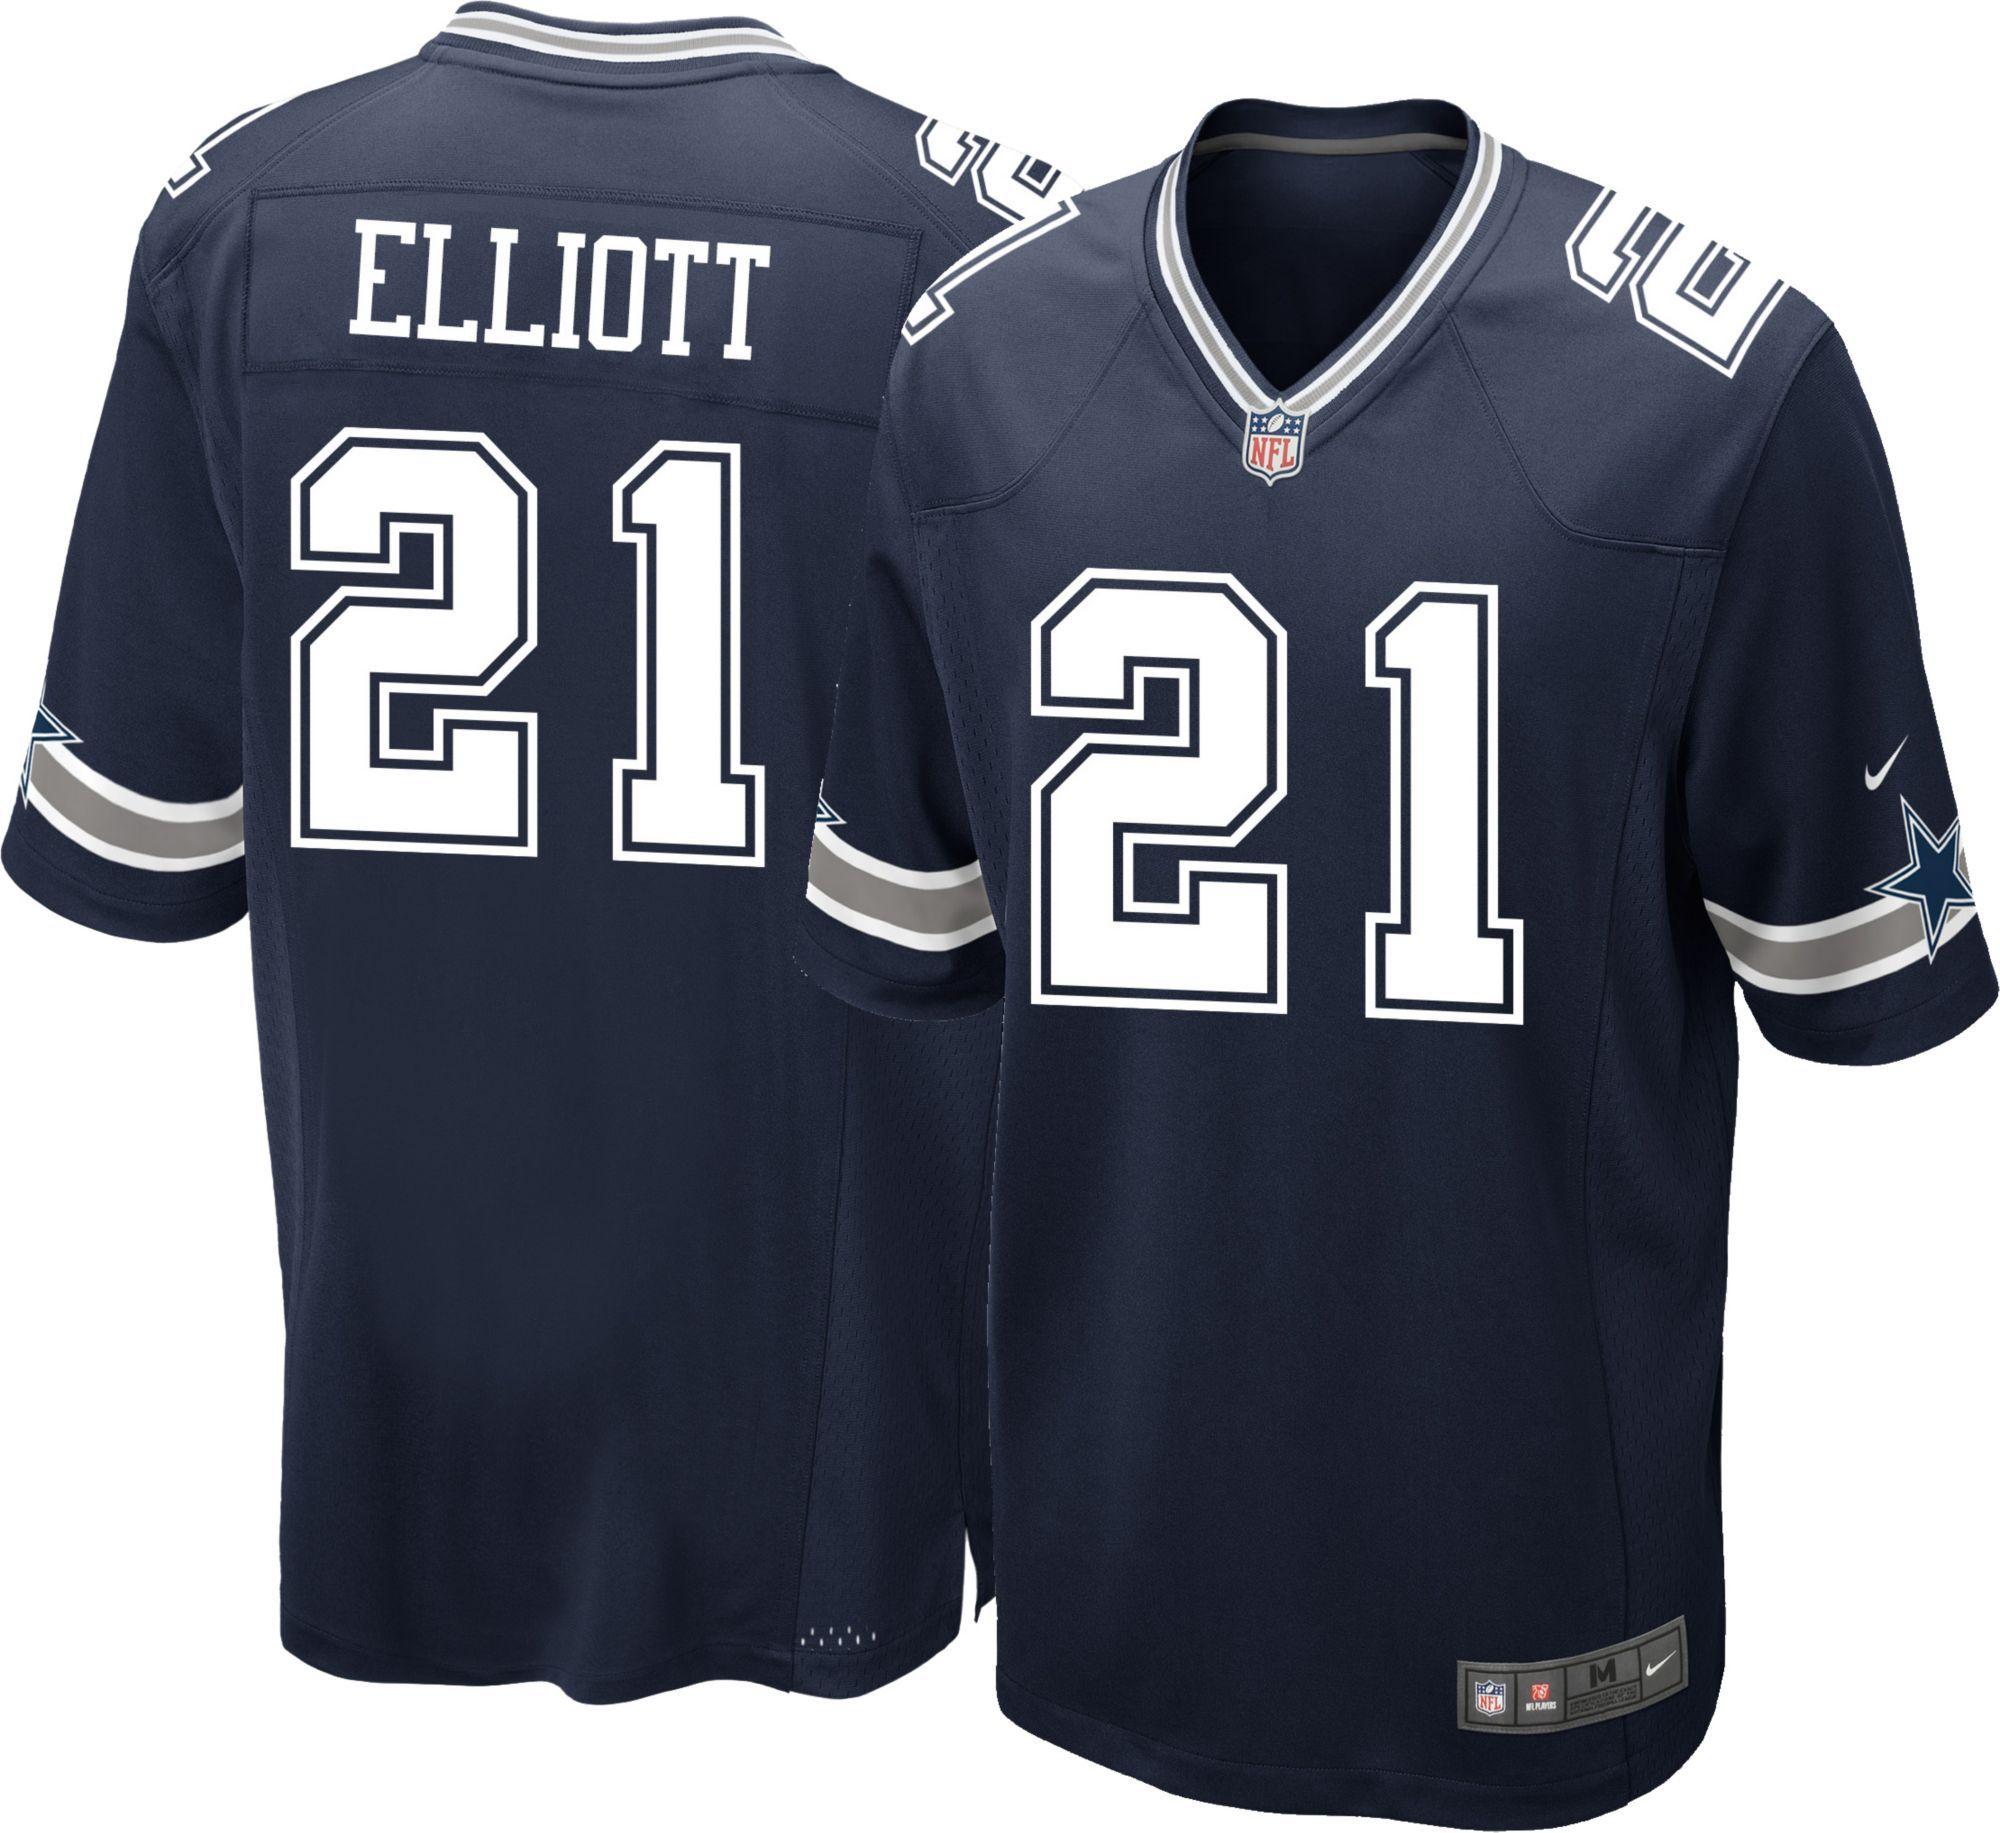 quality design fe904 2de1e Nike Men's Game Jersey Dallas Cowboys Ezekiel Elliott #21 ...